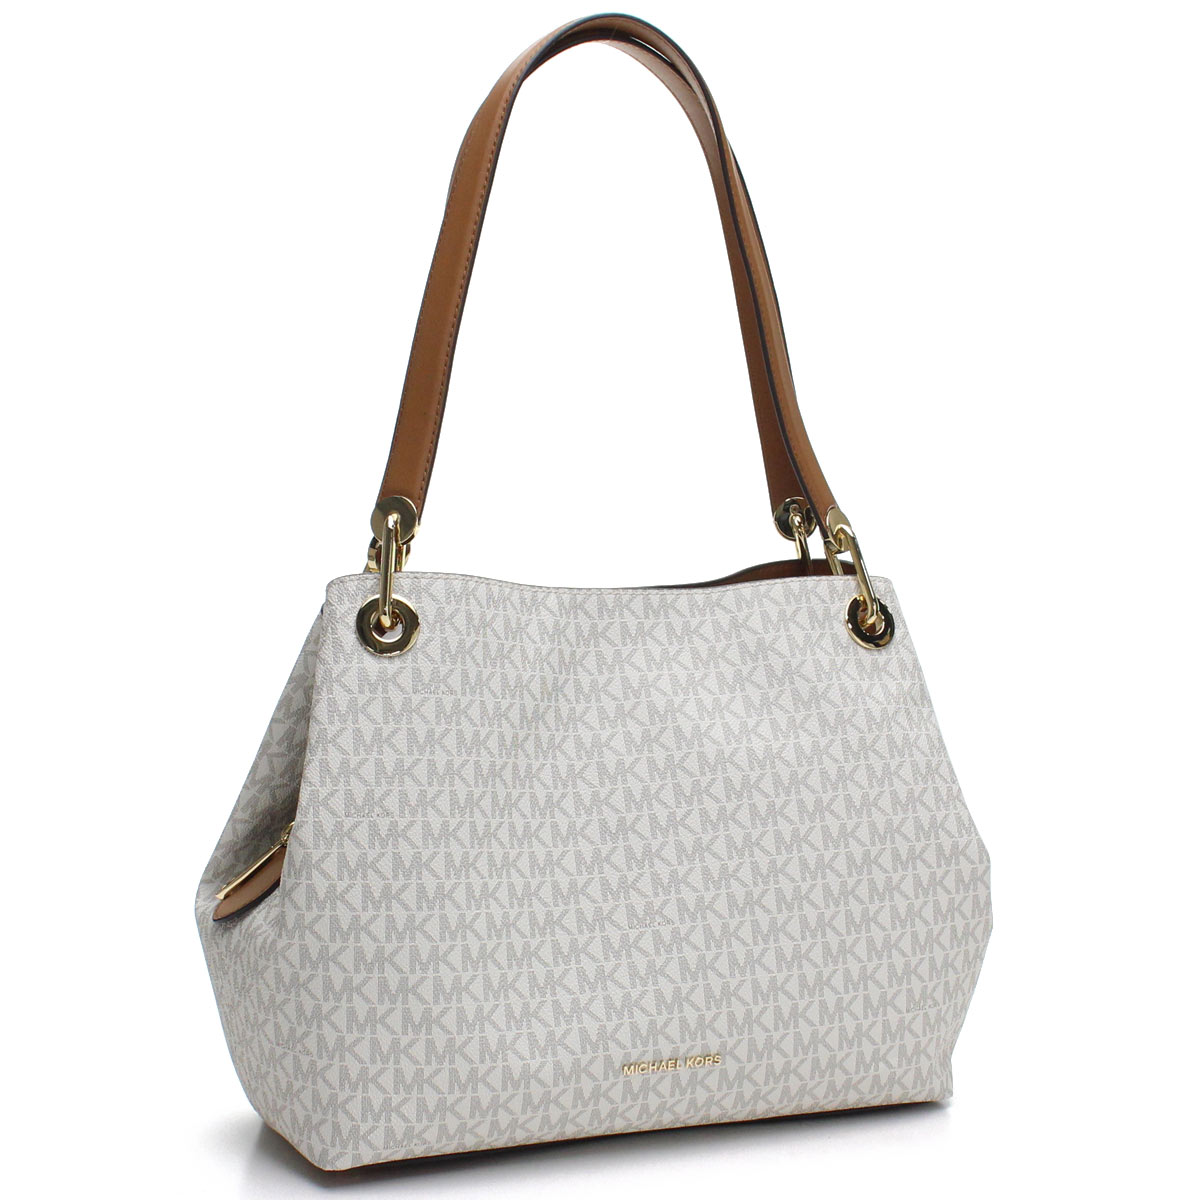 1fd142963f35e Bighit The total brand wholesale  Michael Kors MICHAEL KORS RAVEN tote bag  30H6GRXE3V PVC 150 VANILLA white system